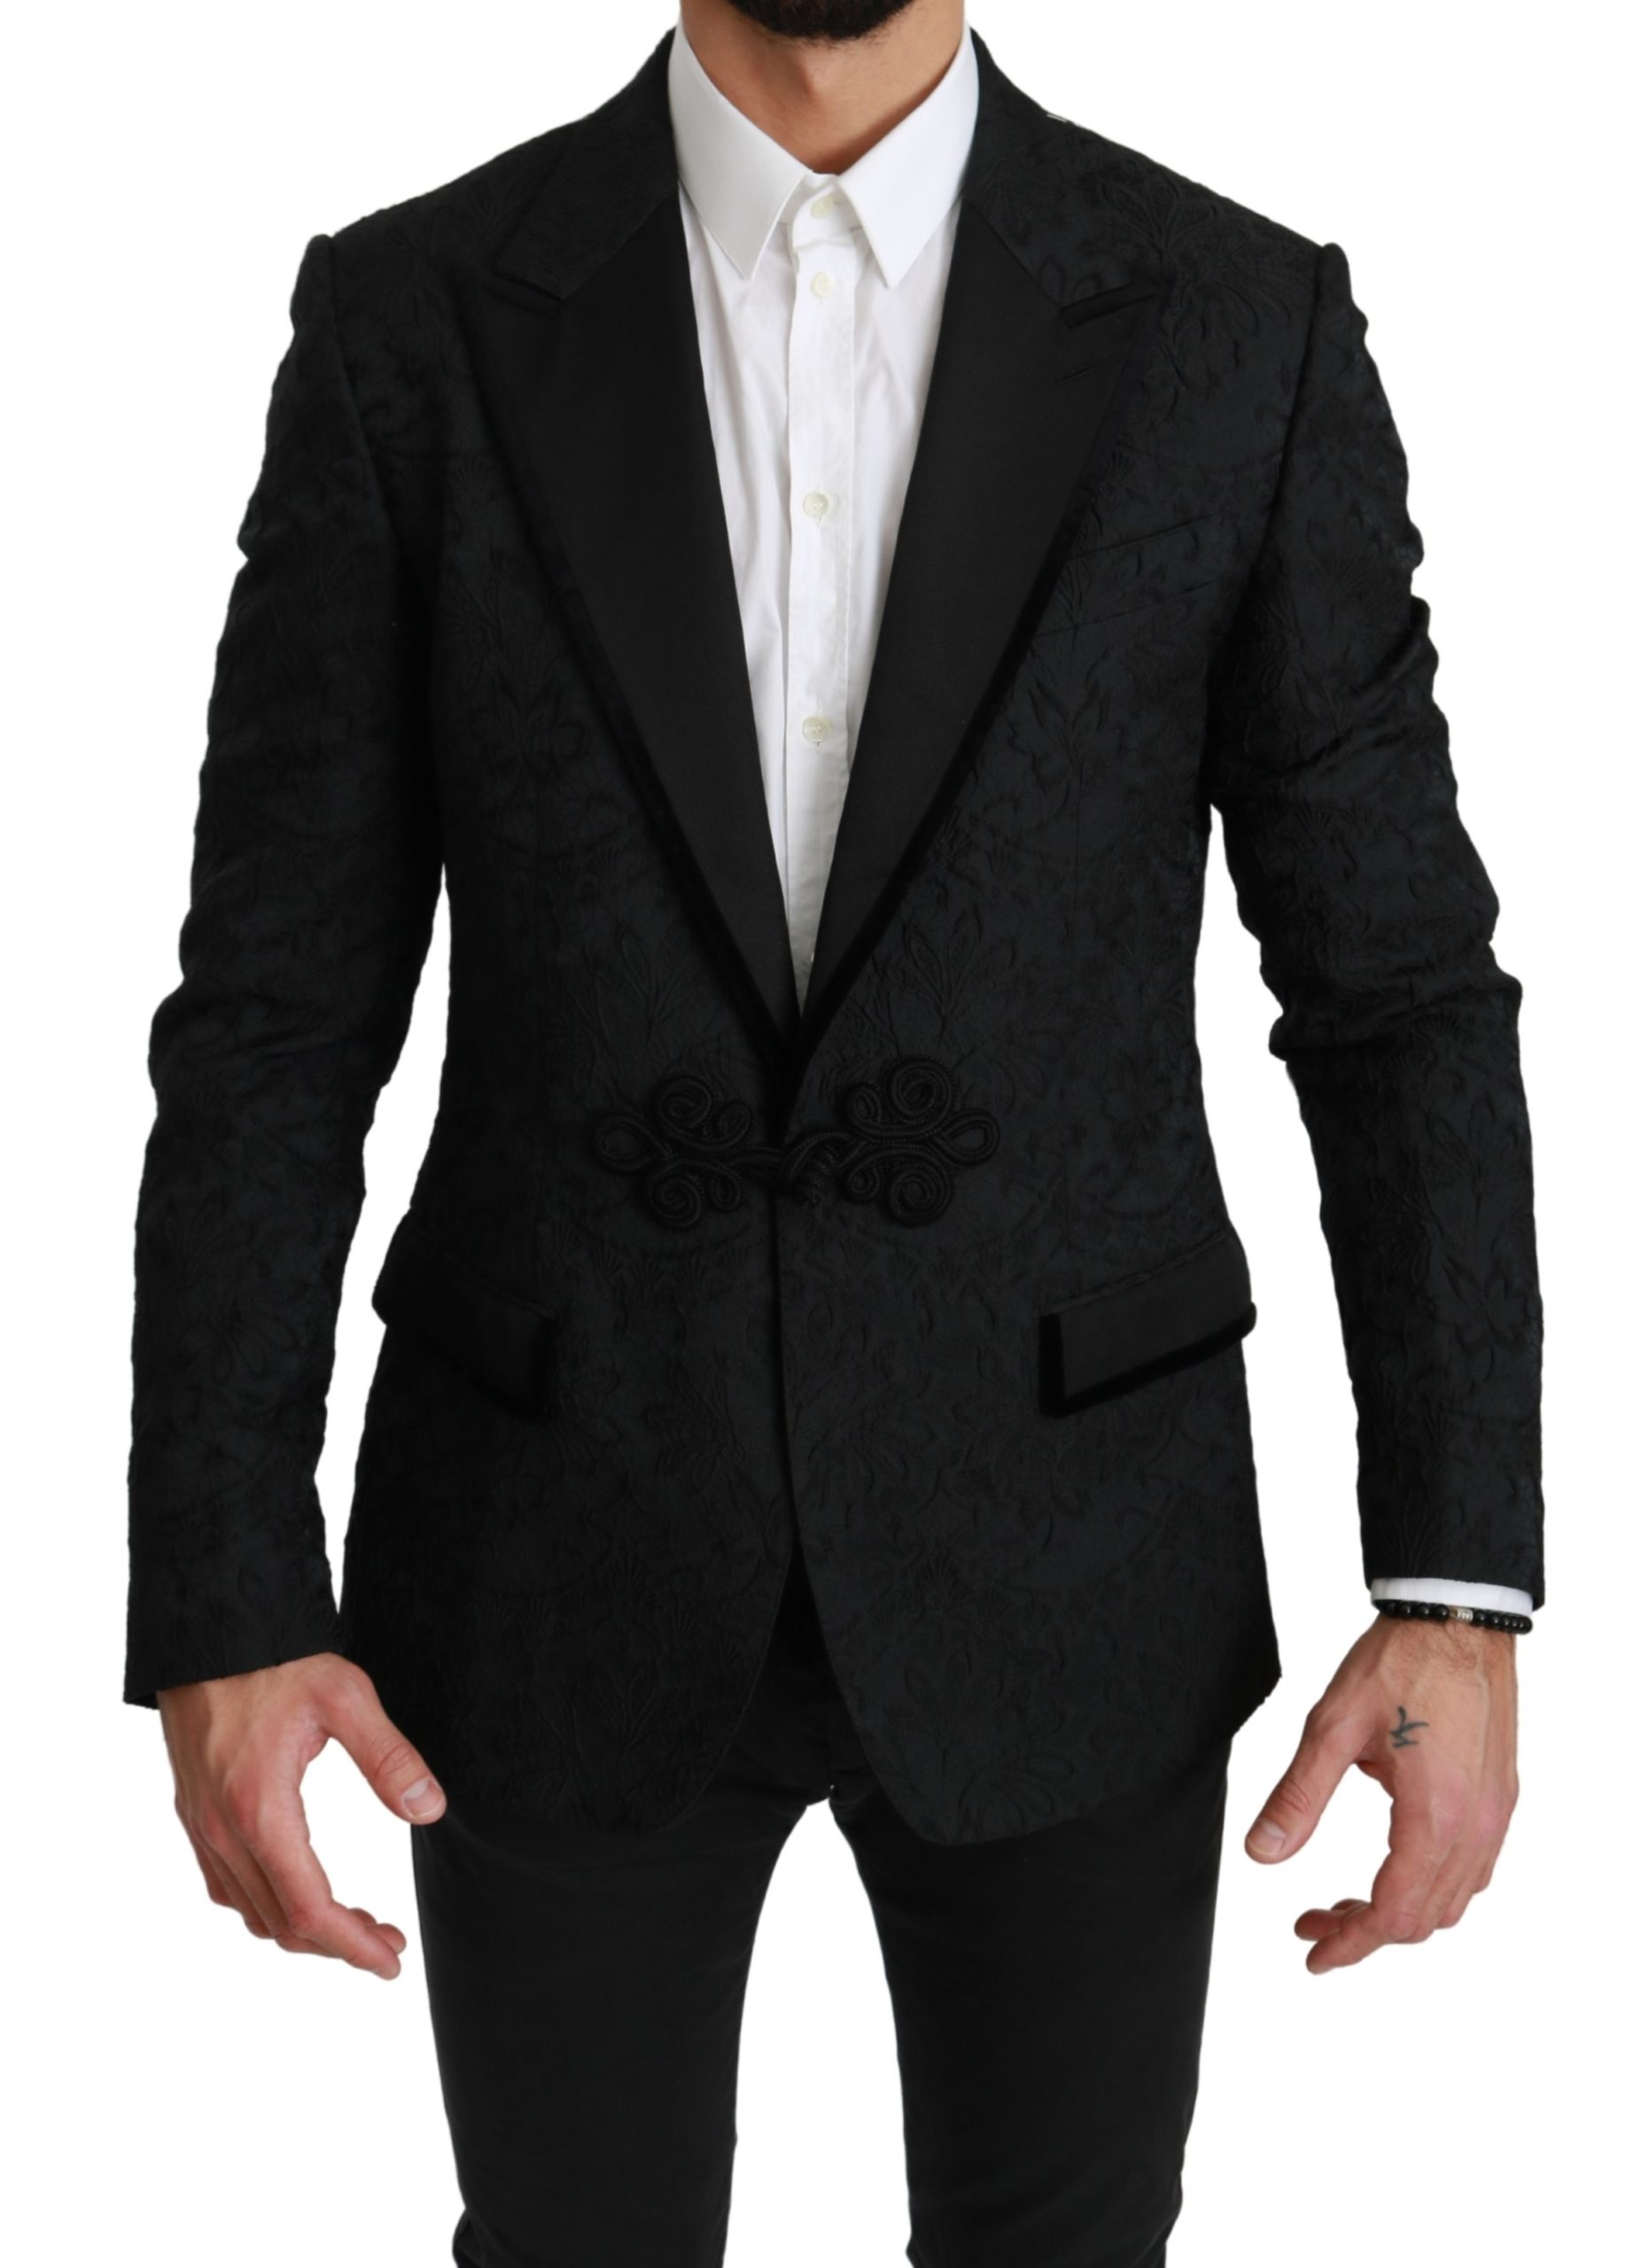 Dolce & Gabbana Men's Jacquard TORERO Lace Blazer Black JKT2533 - IT50   L